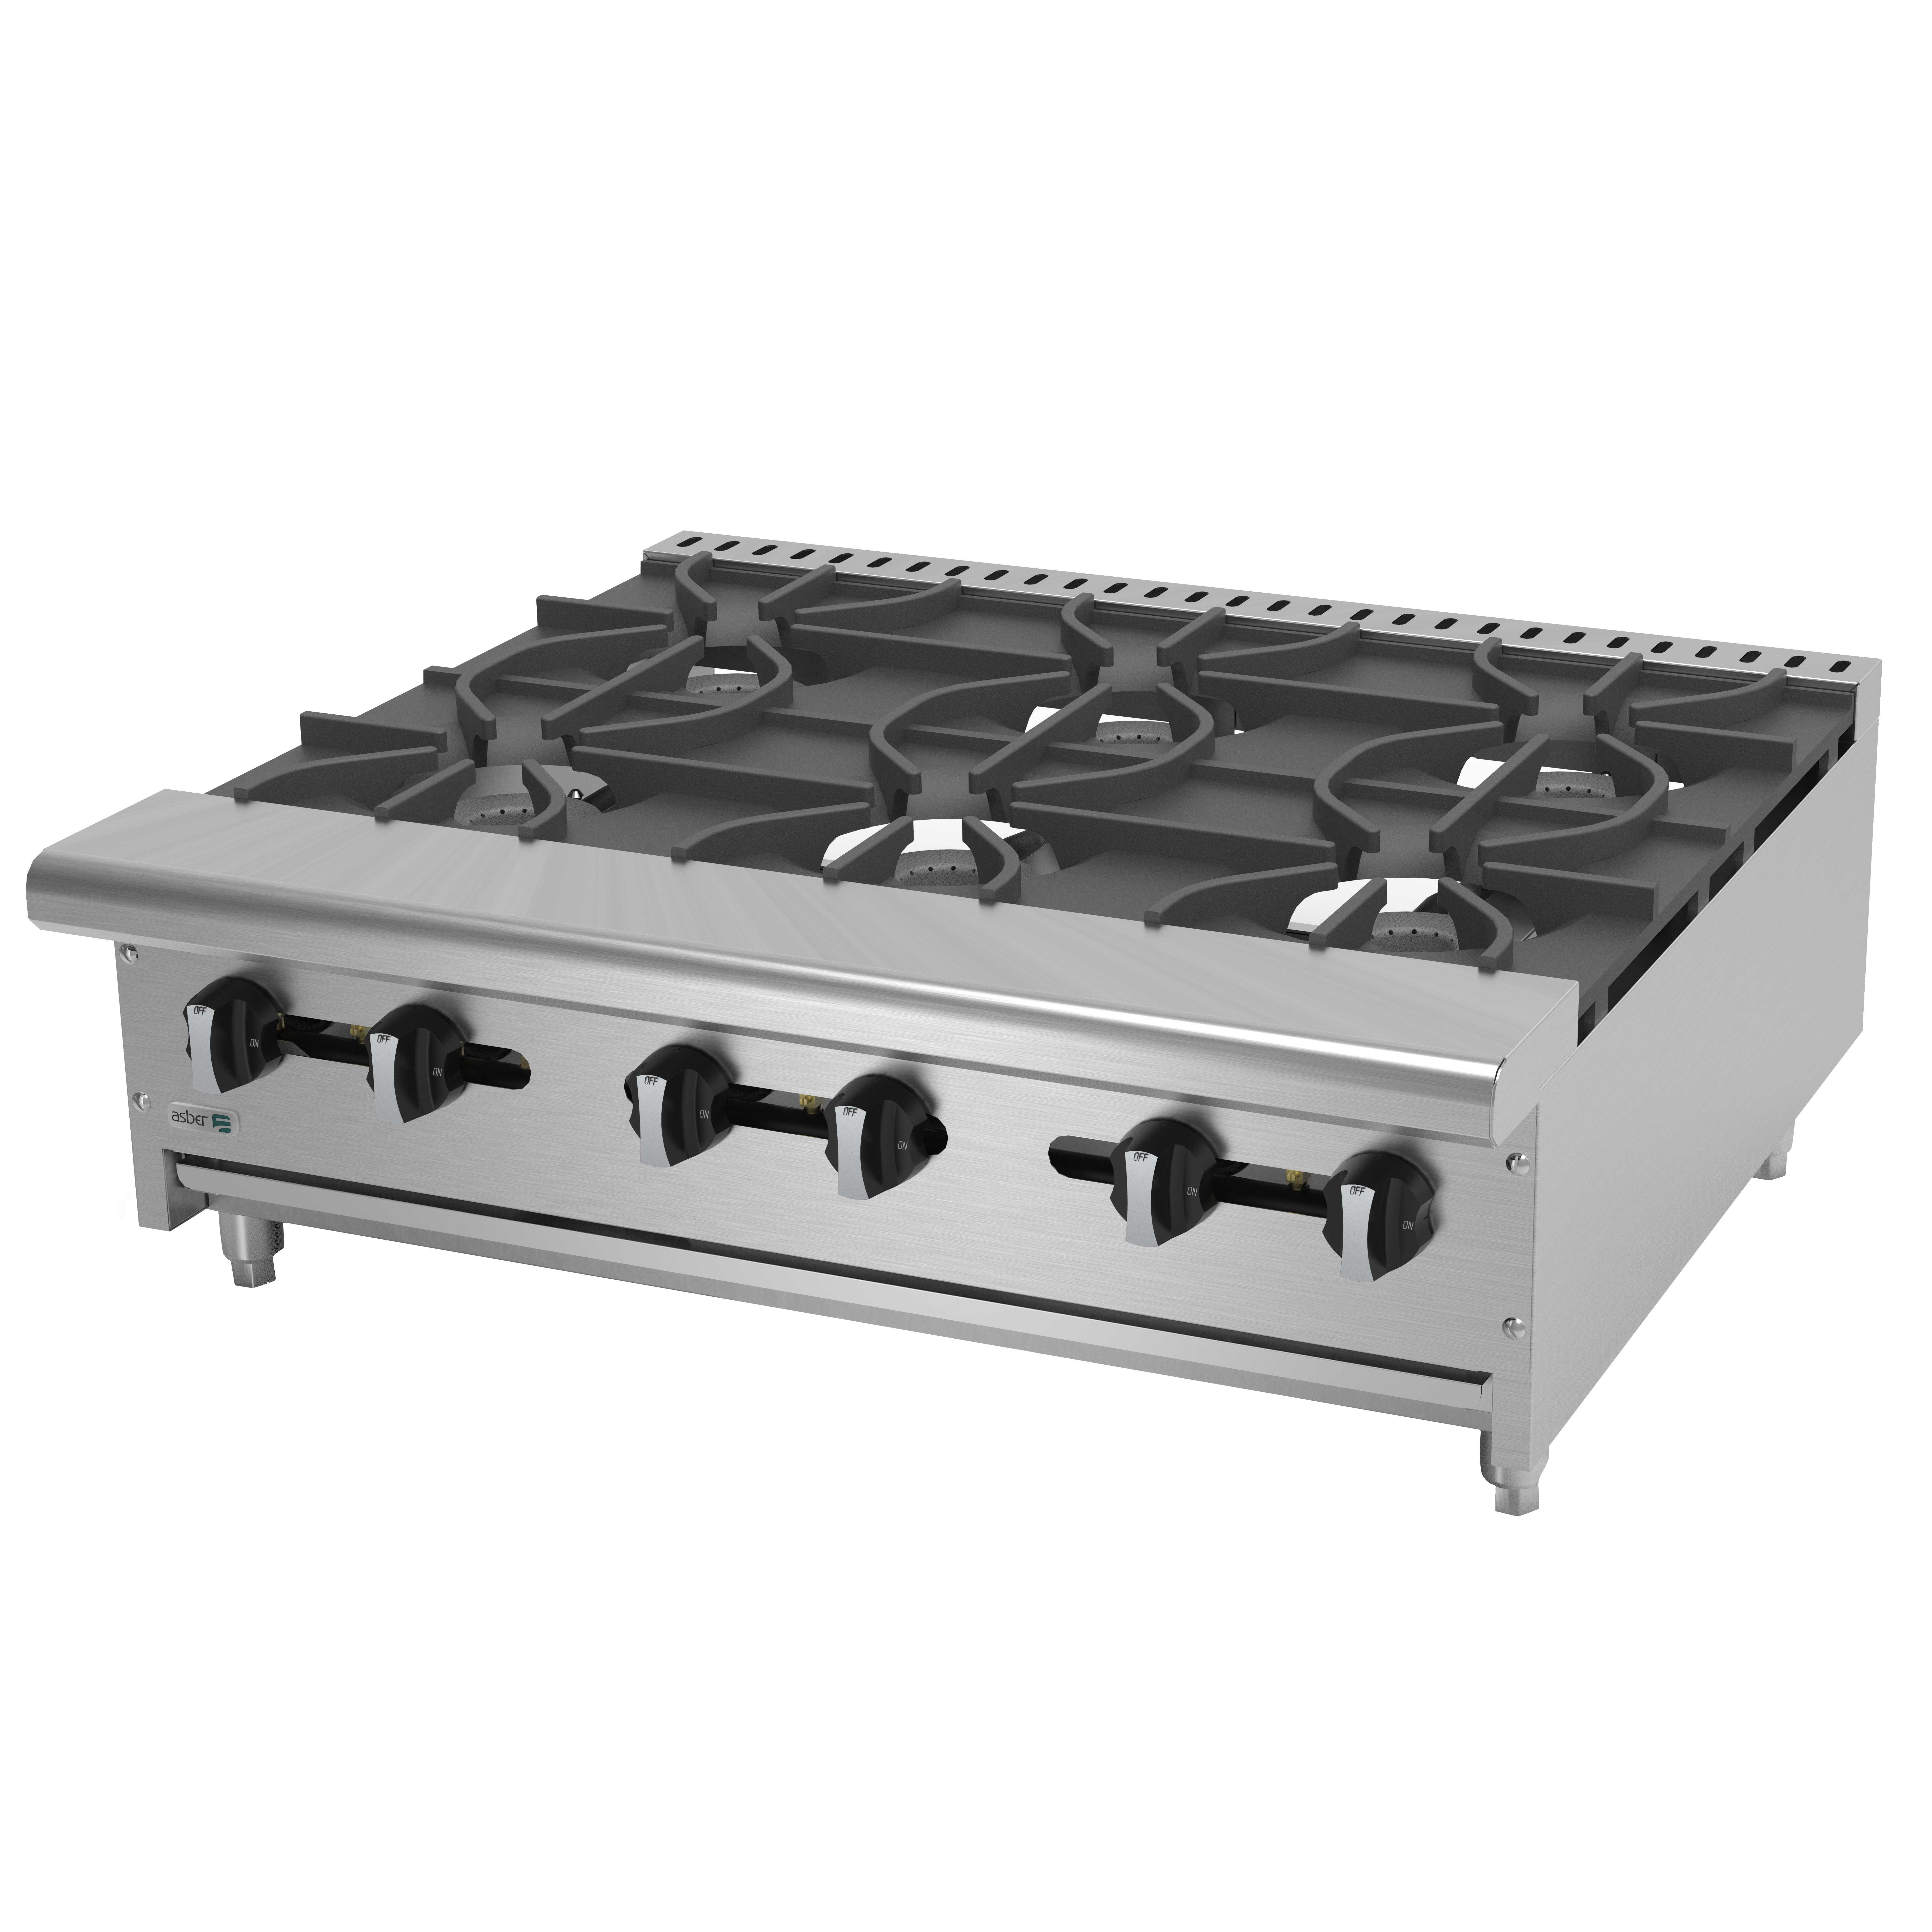 Asber AEHP-6-36 hotplate, countertop, gas